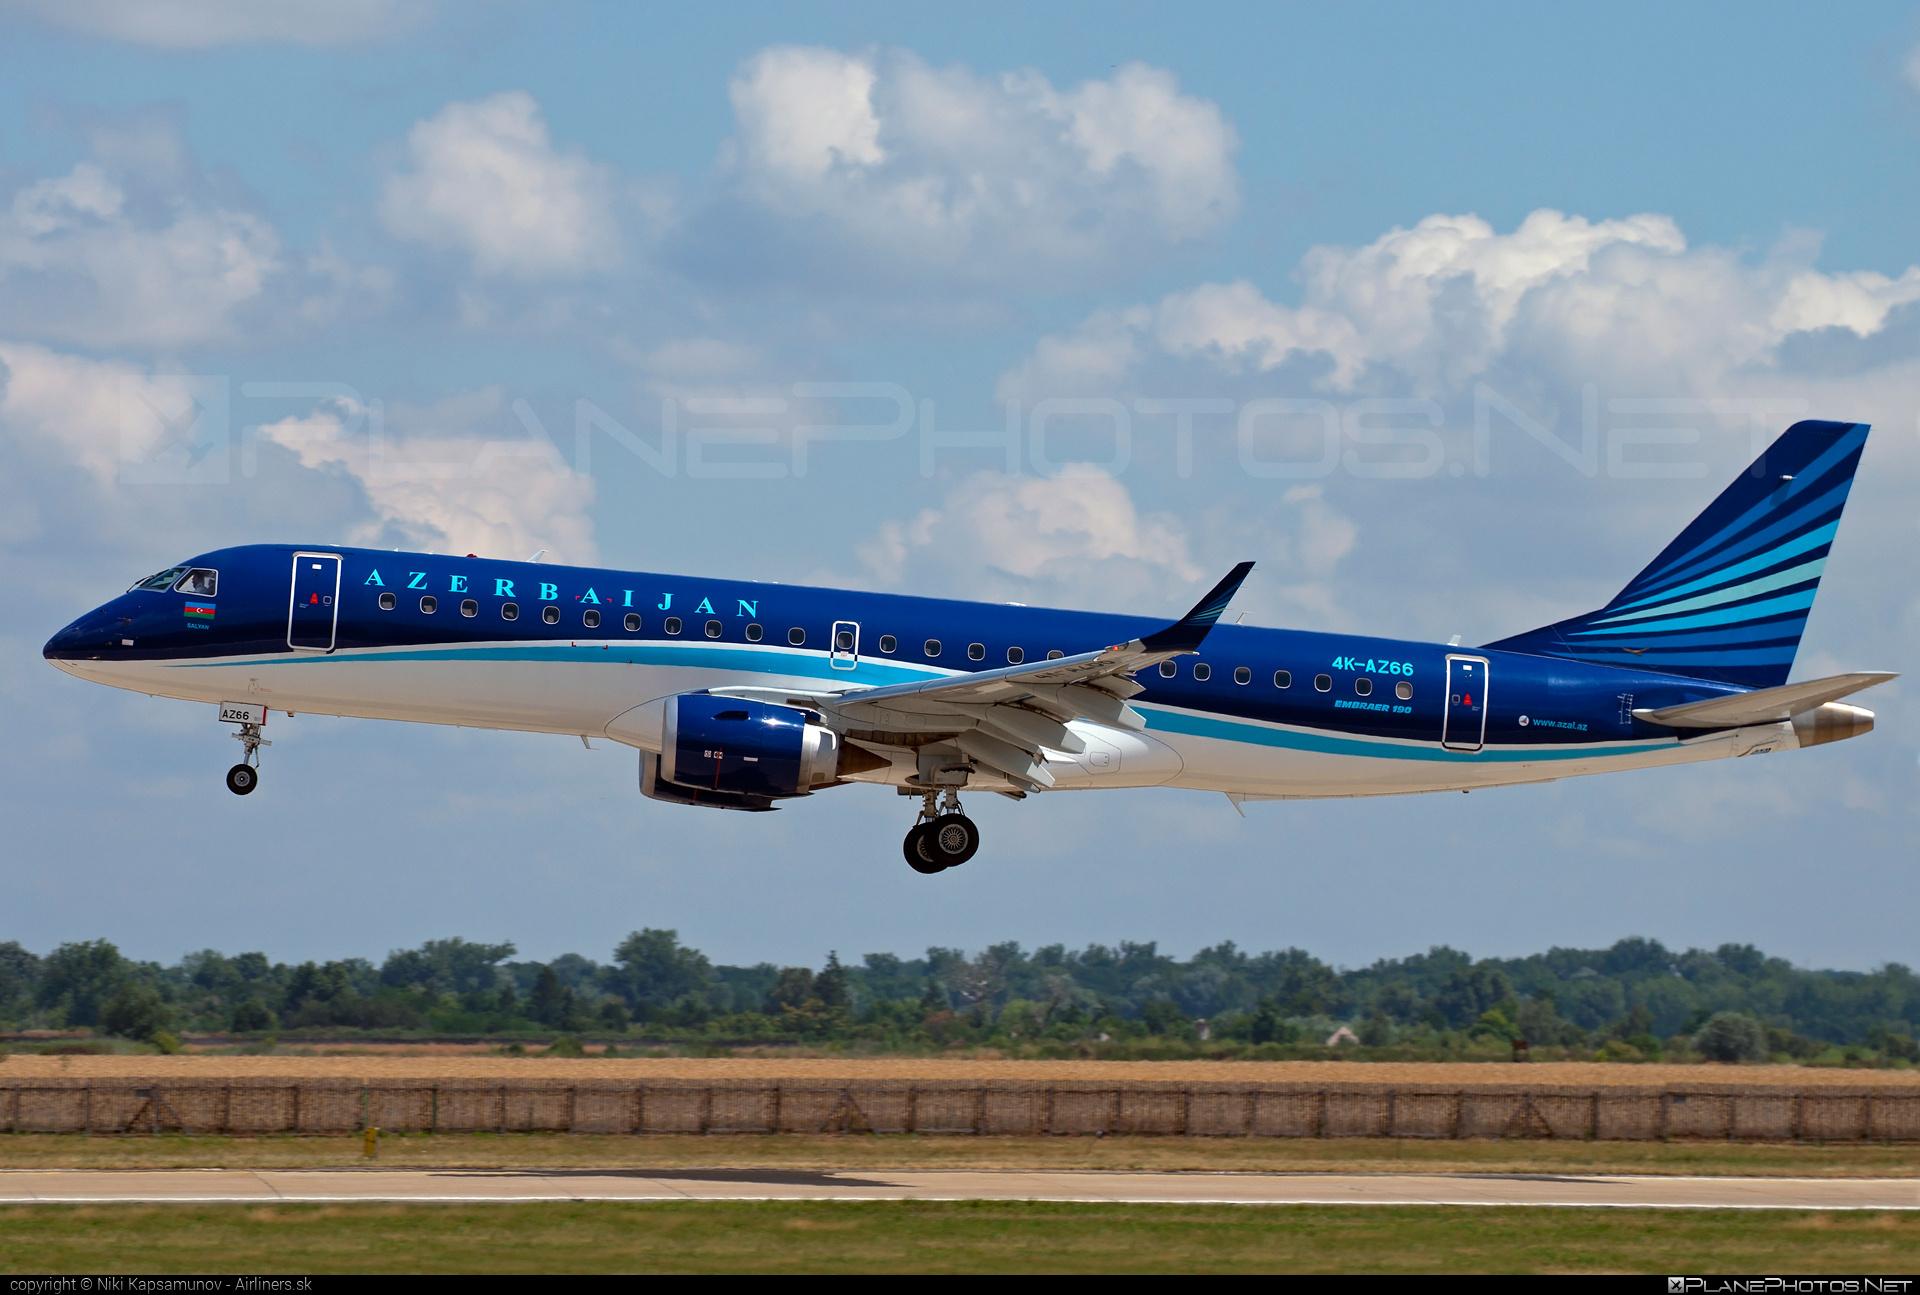 Embraer E190IGW (ERJ-190-100IGW) - 4K-AZ66 operated by AZAL Azerbaijan Airlines #e190 #e190100 #e190100igw #e190igw #embraer #embraer190 #embraer190100igw #embraer190igw